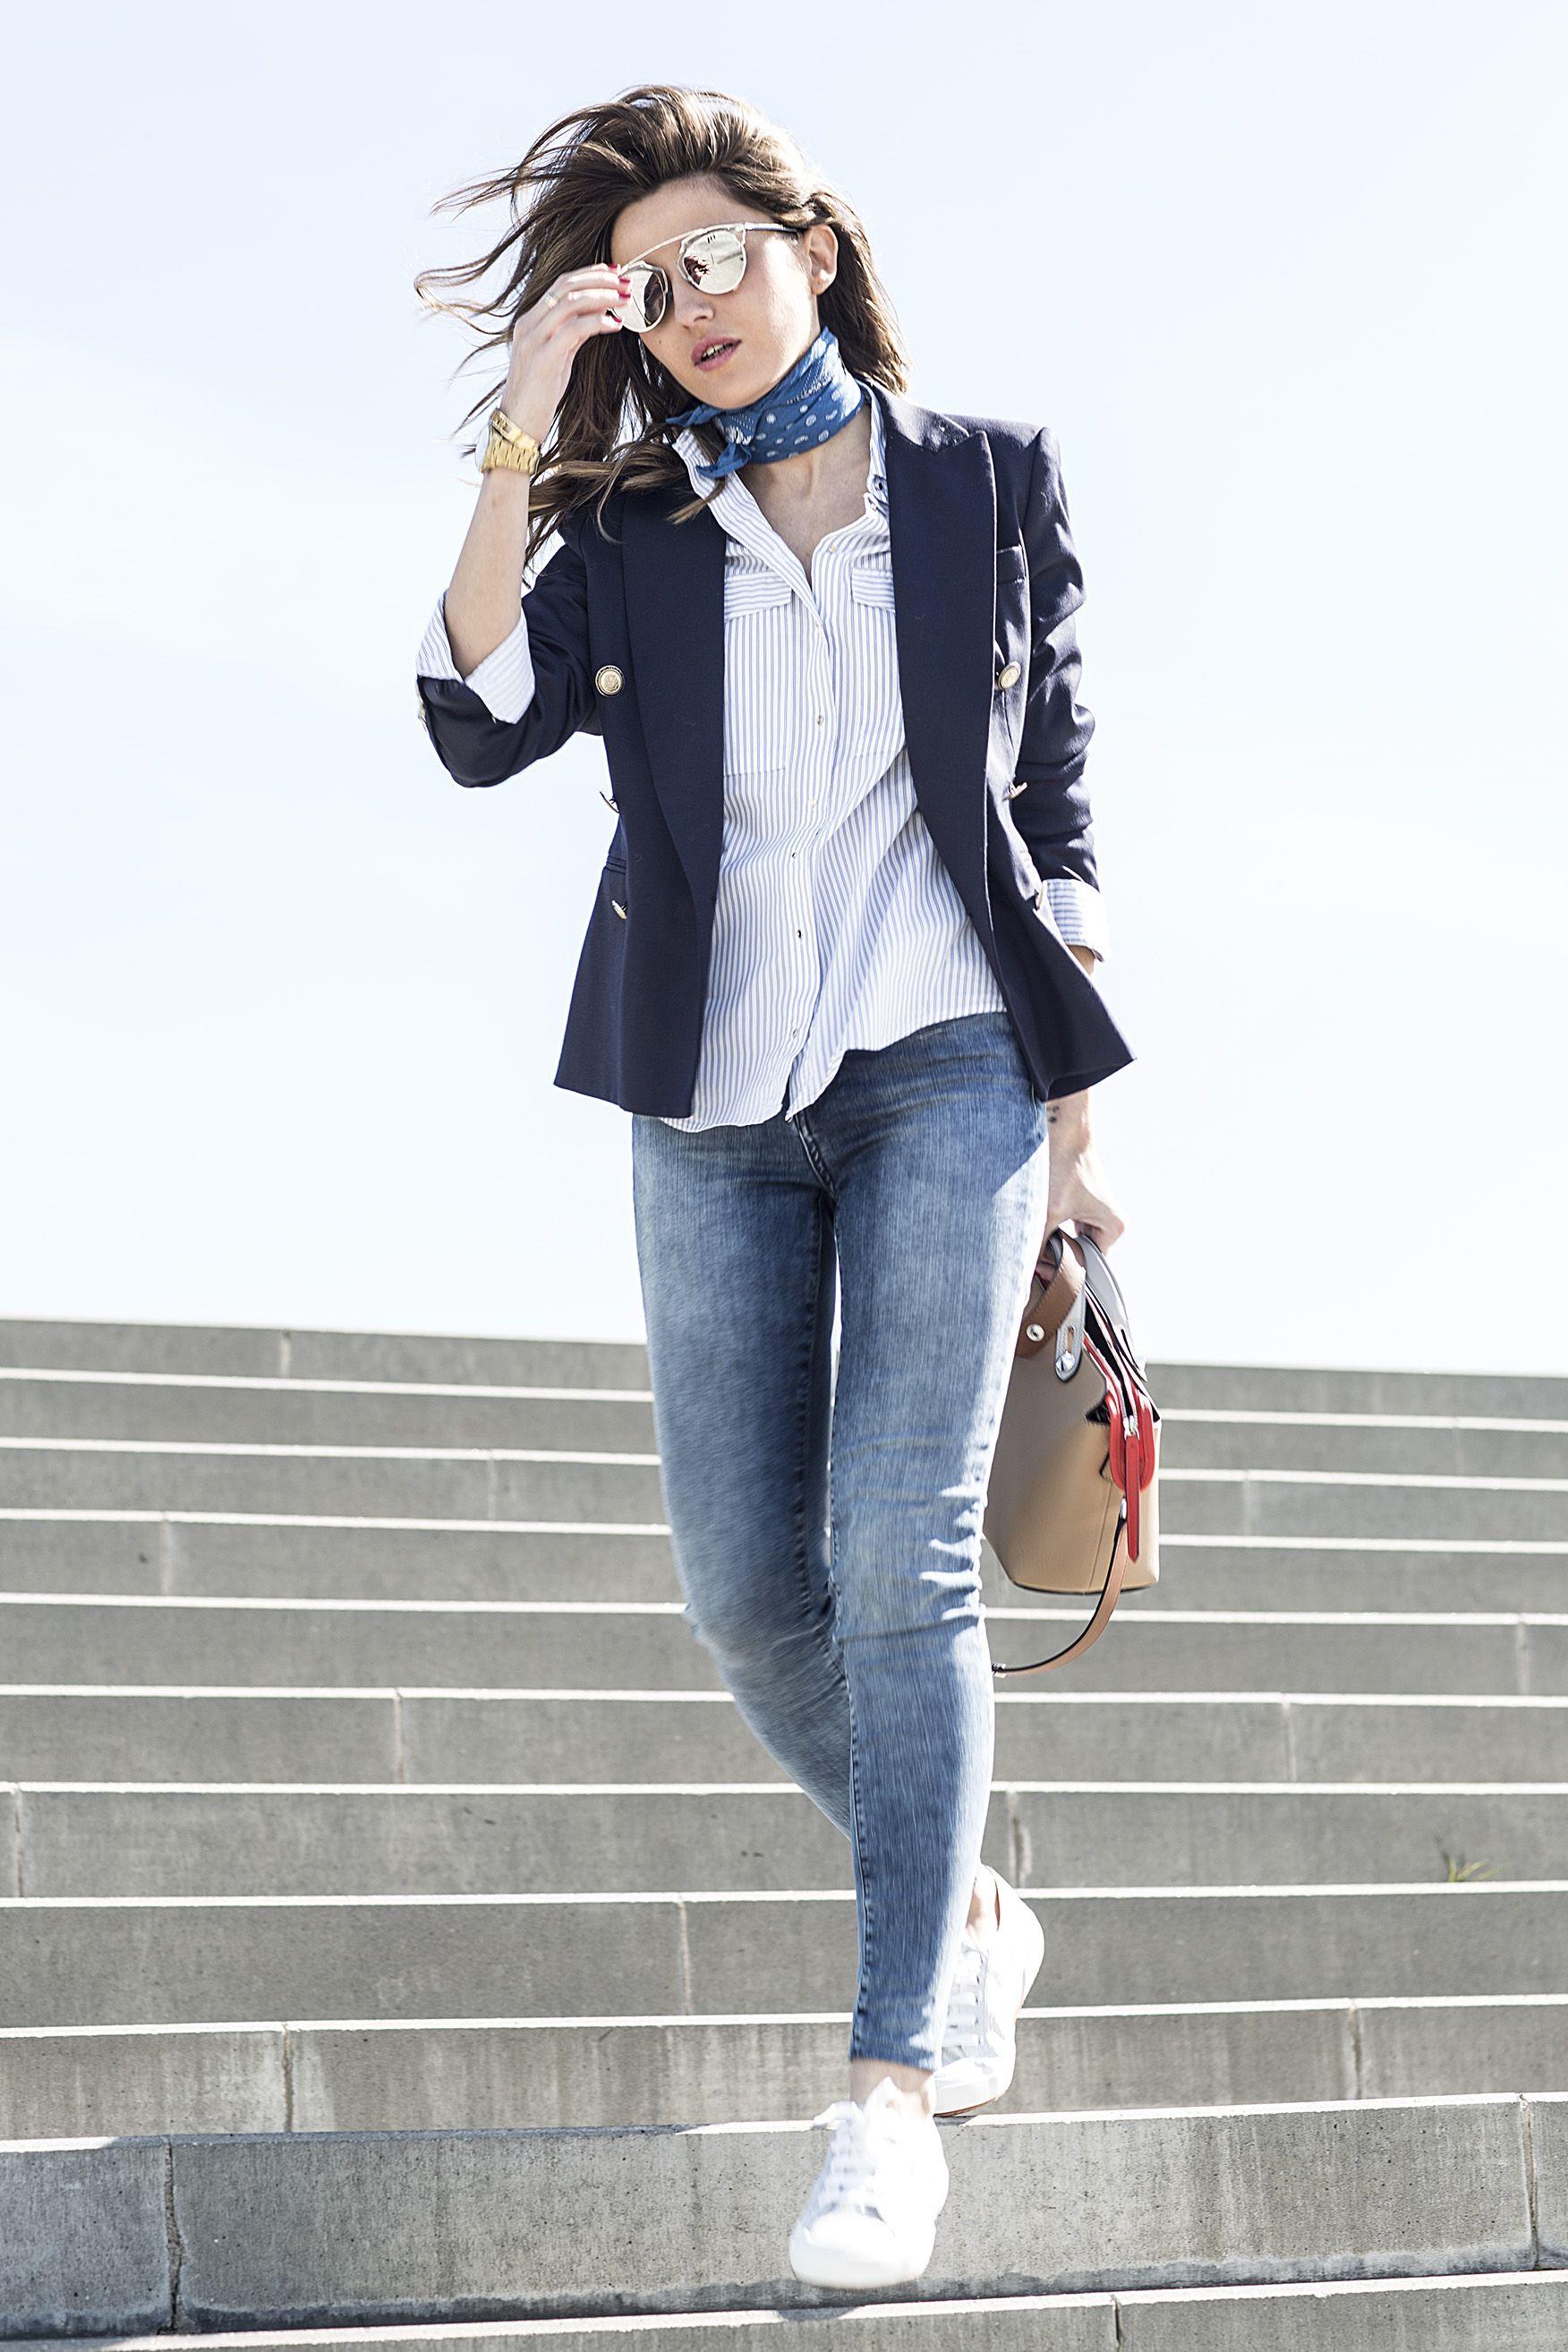 27532439e7c 2016 sneakers  Superga – Ulanka jeans  Guess blazer  Zara shirt  Zara (old)  bag  Fendi